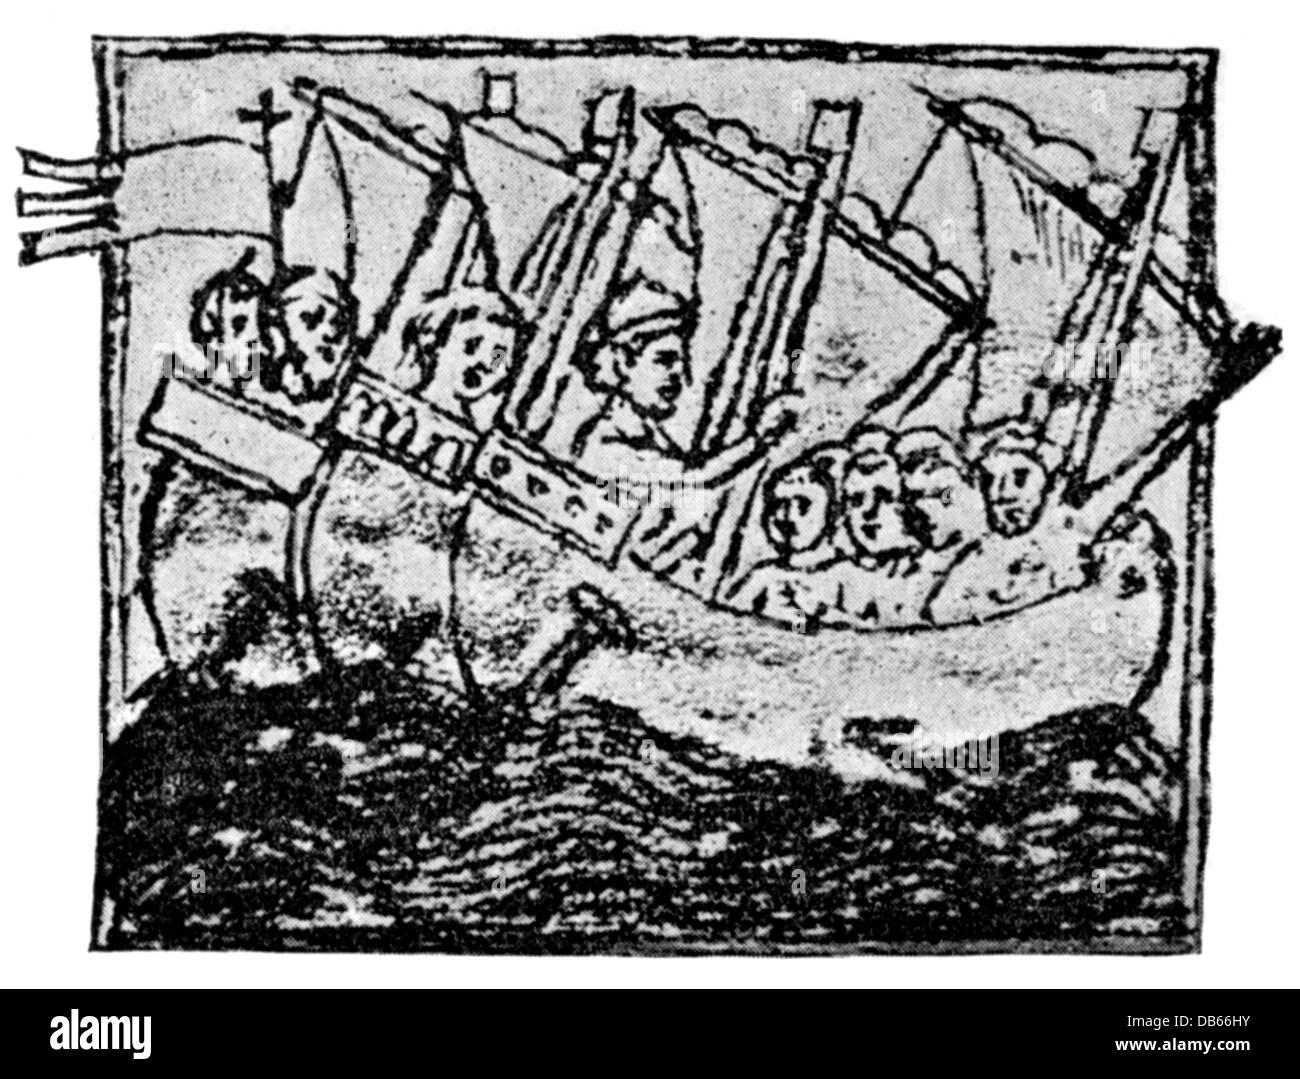 Middle Ages, crusades, crusader ships, illustration from 'De passagiis in Terram sanctam', 1879, Additional - Stock Image